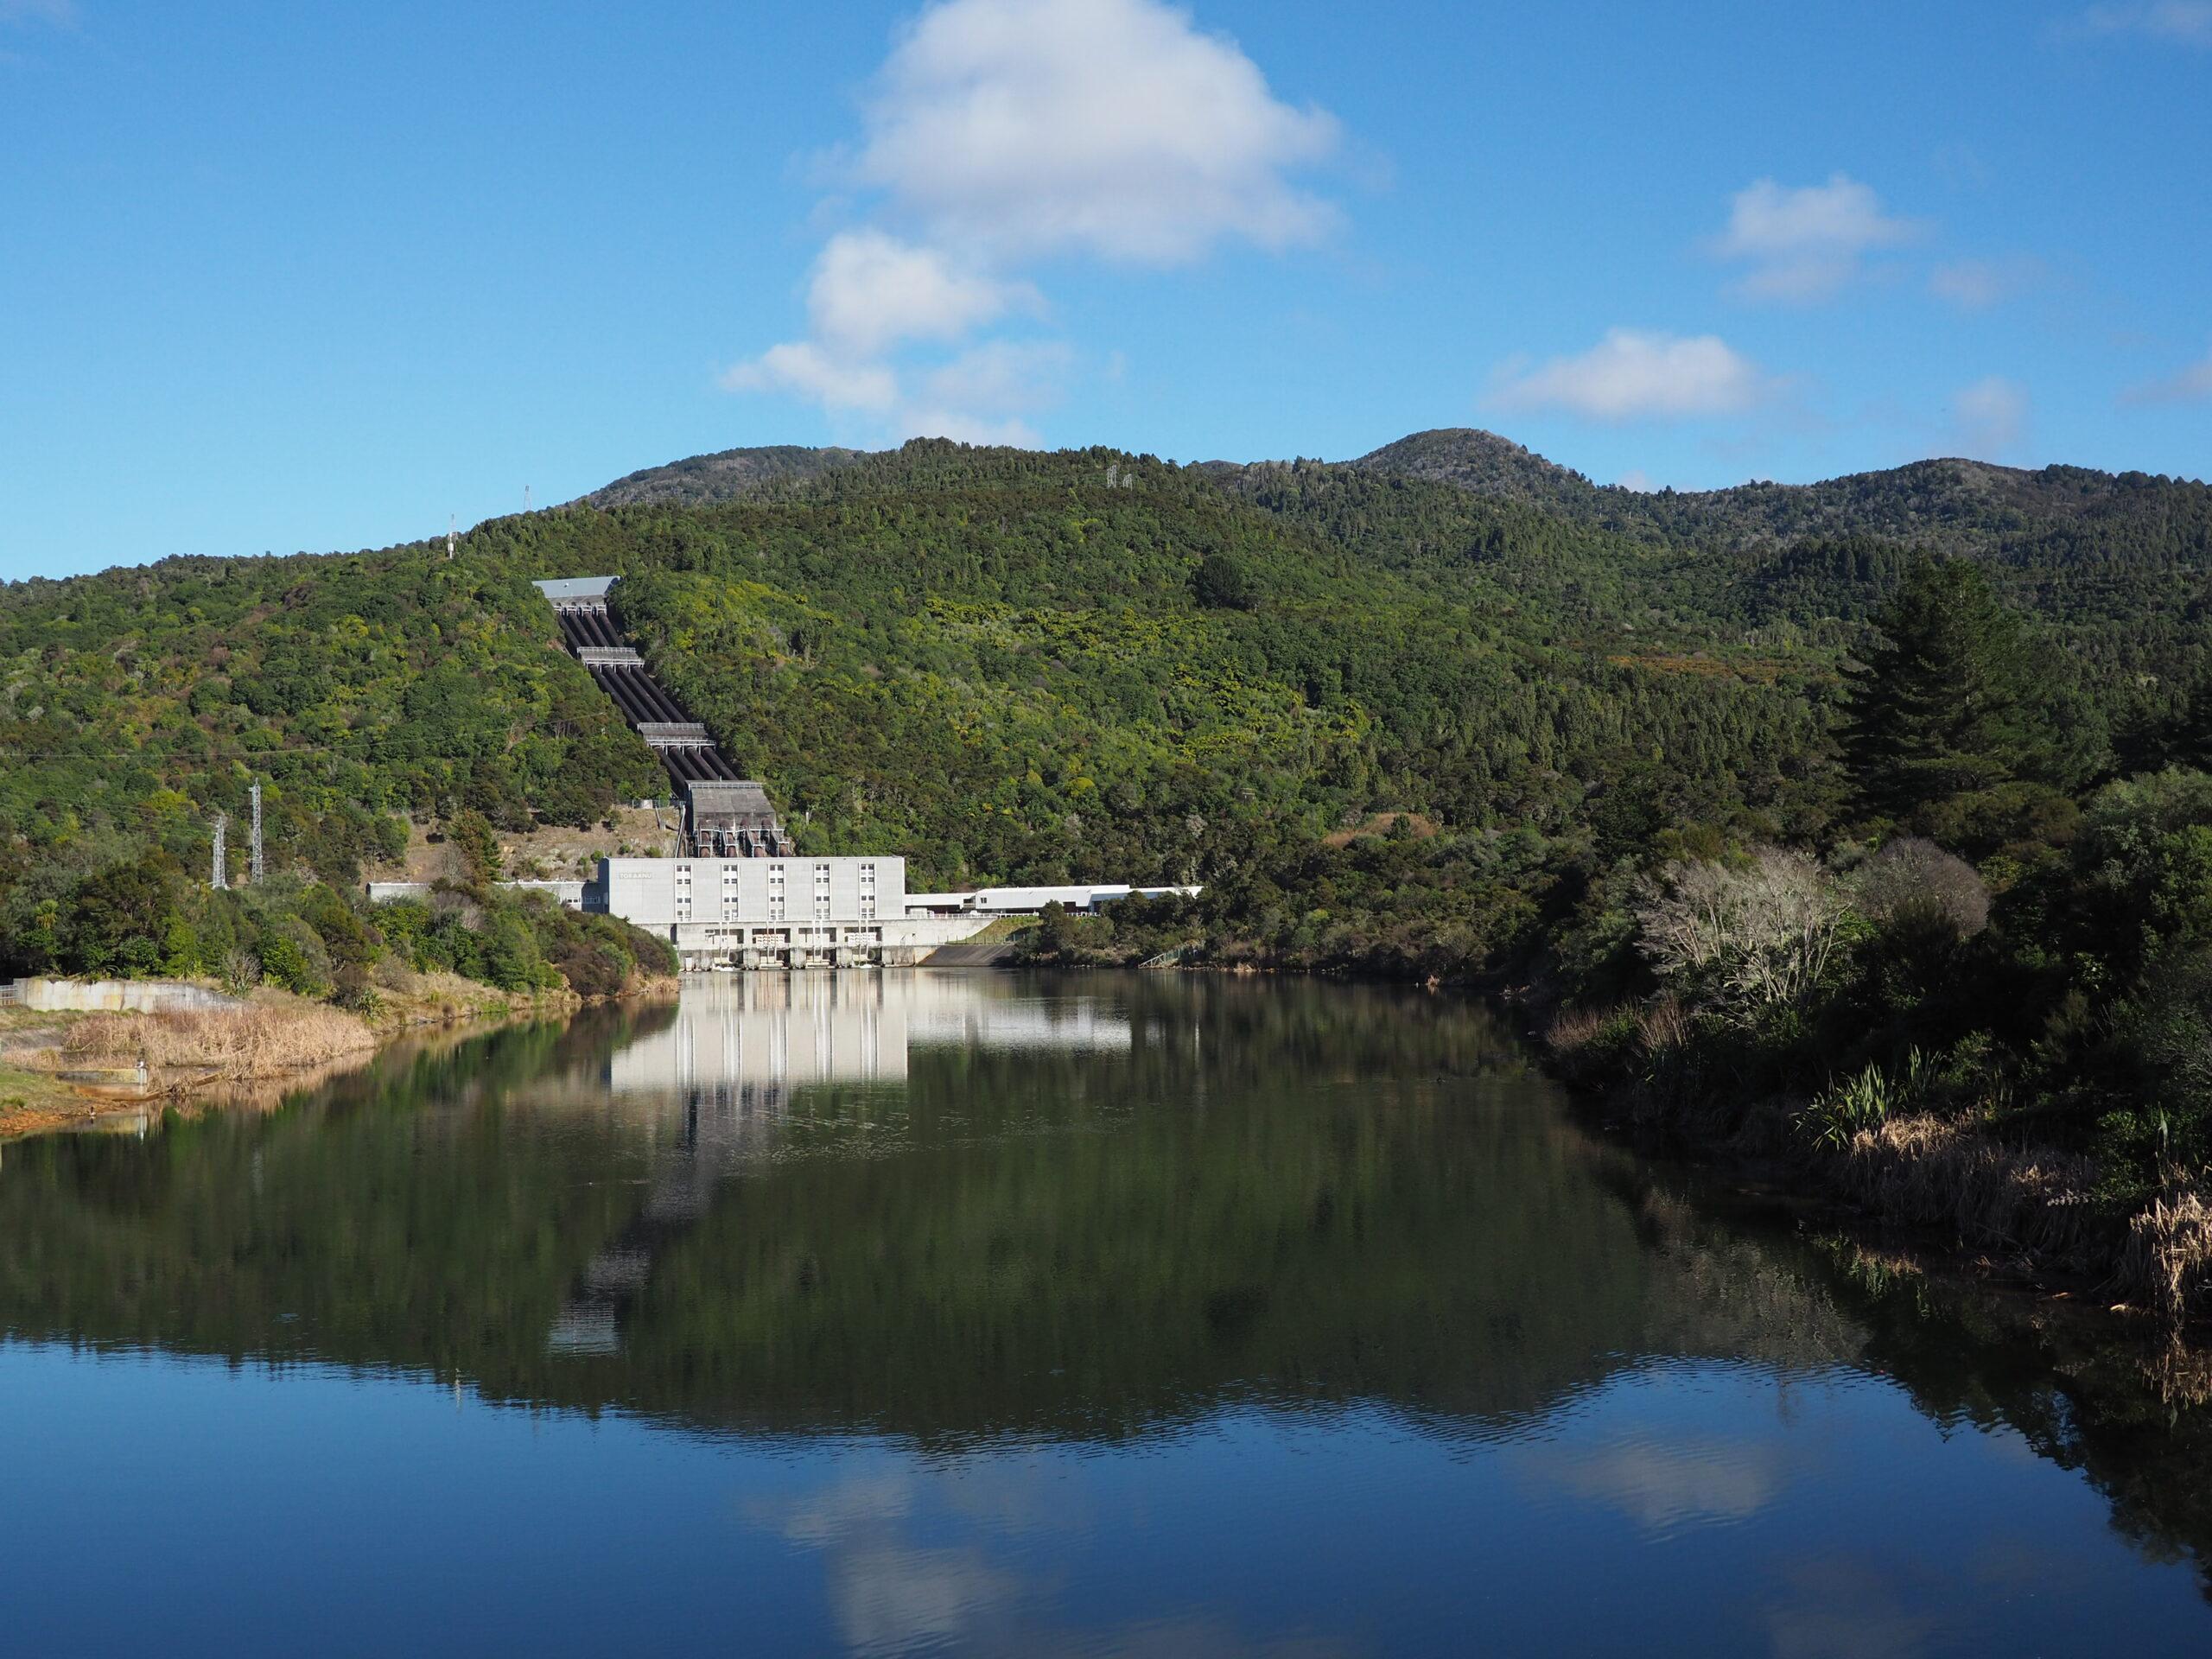 Tokaanu Power Station